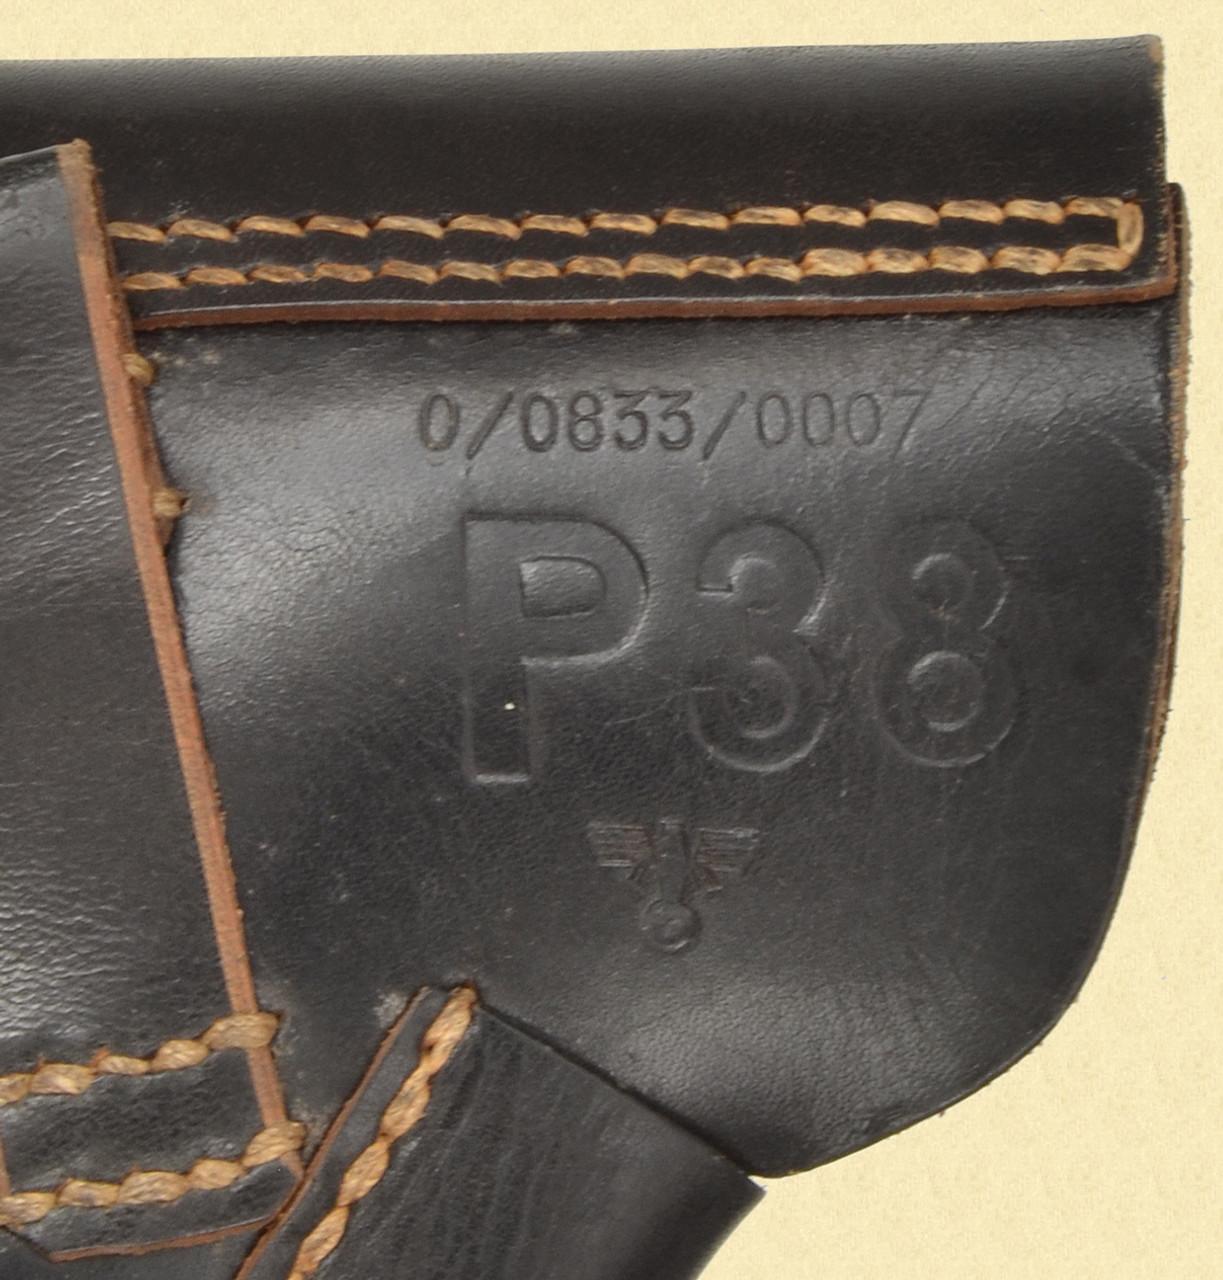 GERMAN P 38 POLICE HOLSTER - M7624